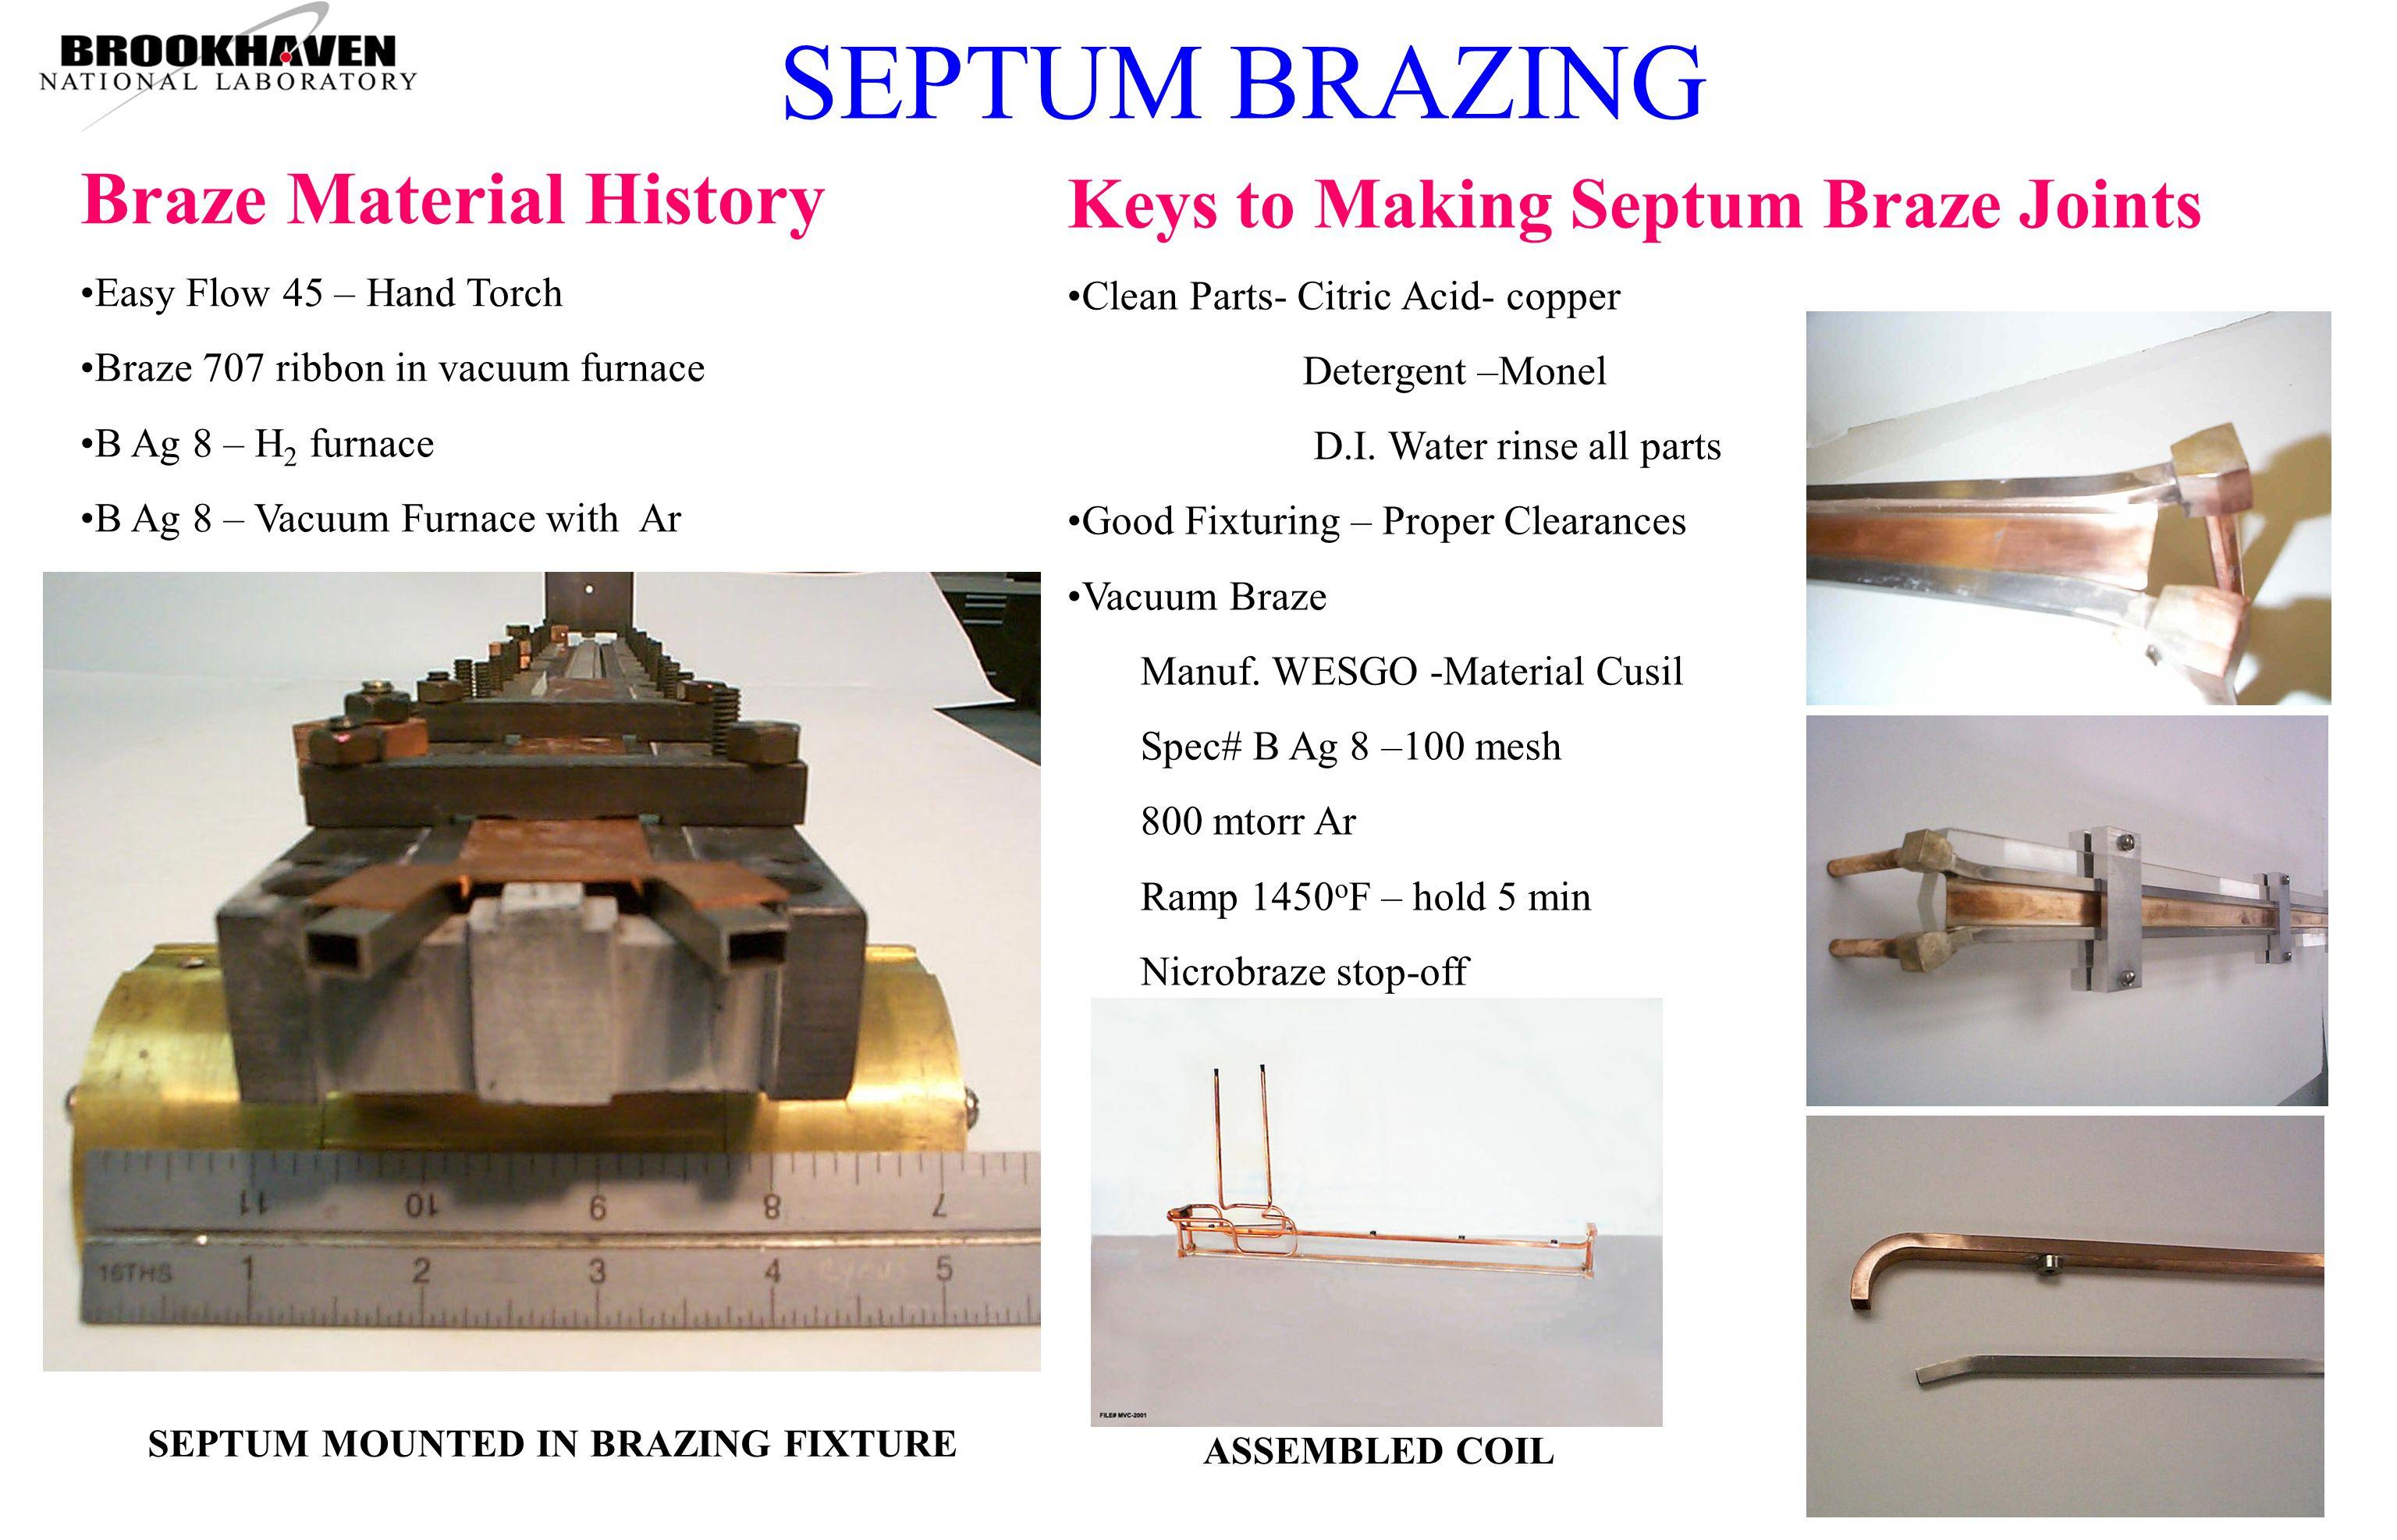 Keys to Making Septum Braze Joints Clean Parts- Citric Acid- copper Detergent –Monel D.I.